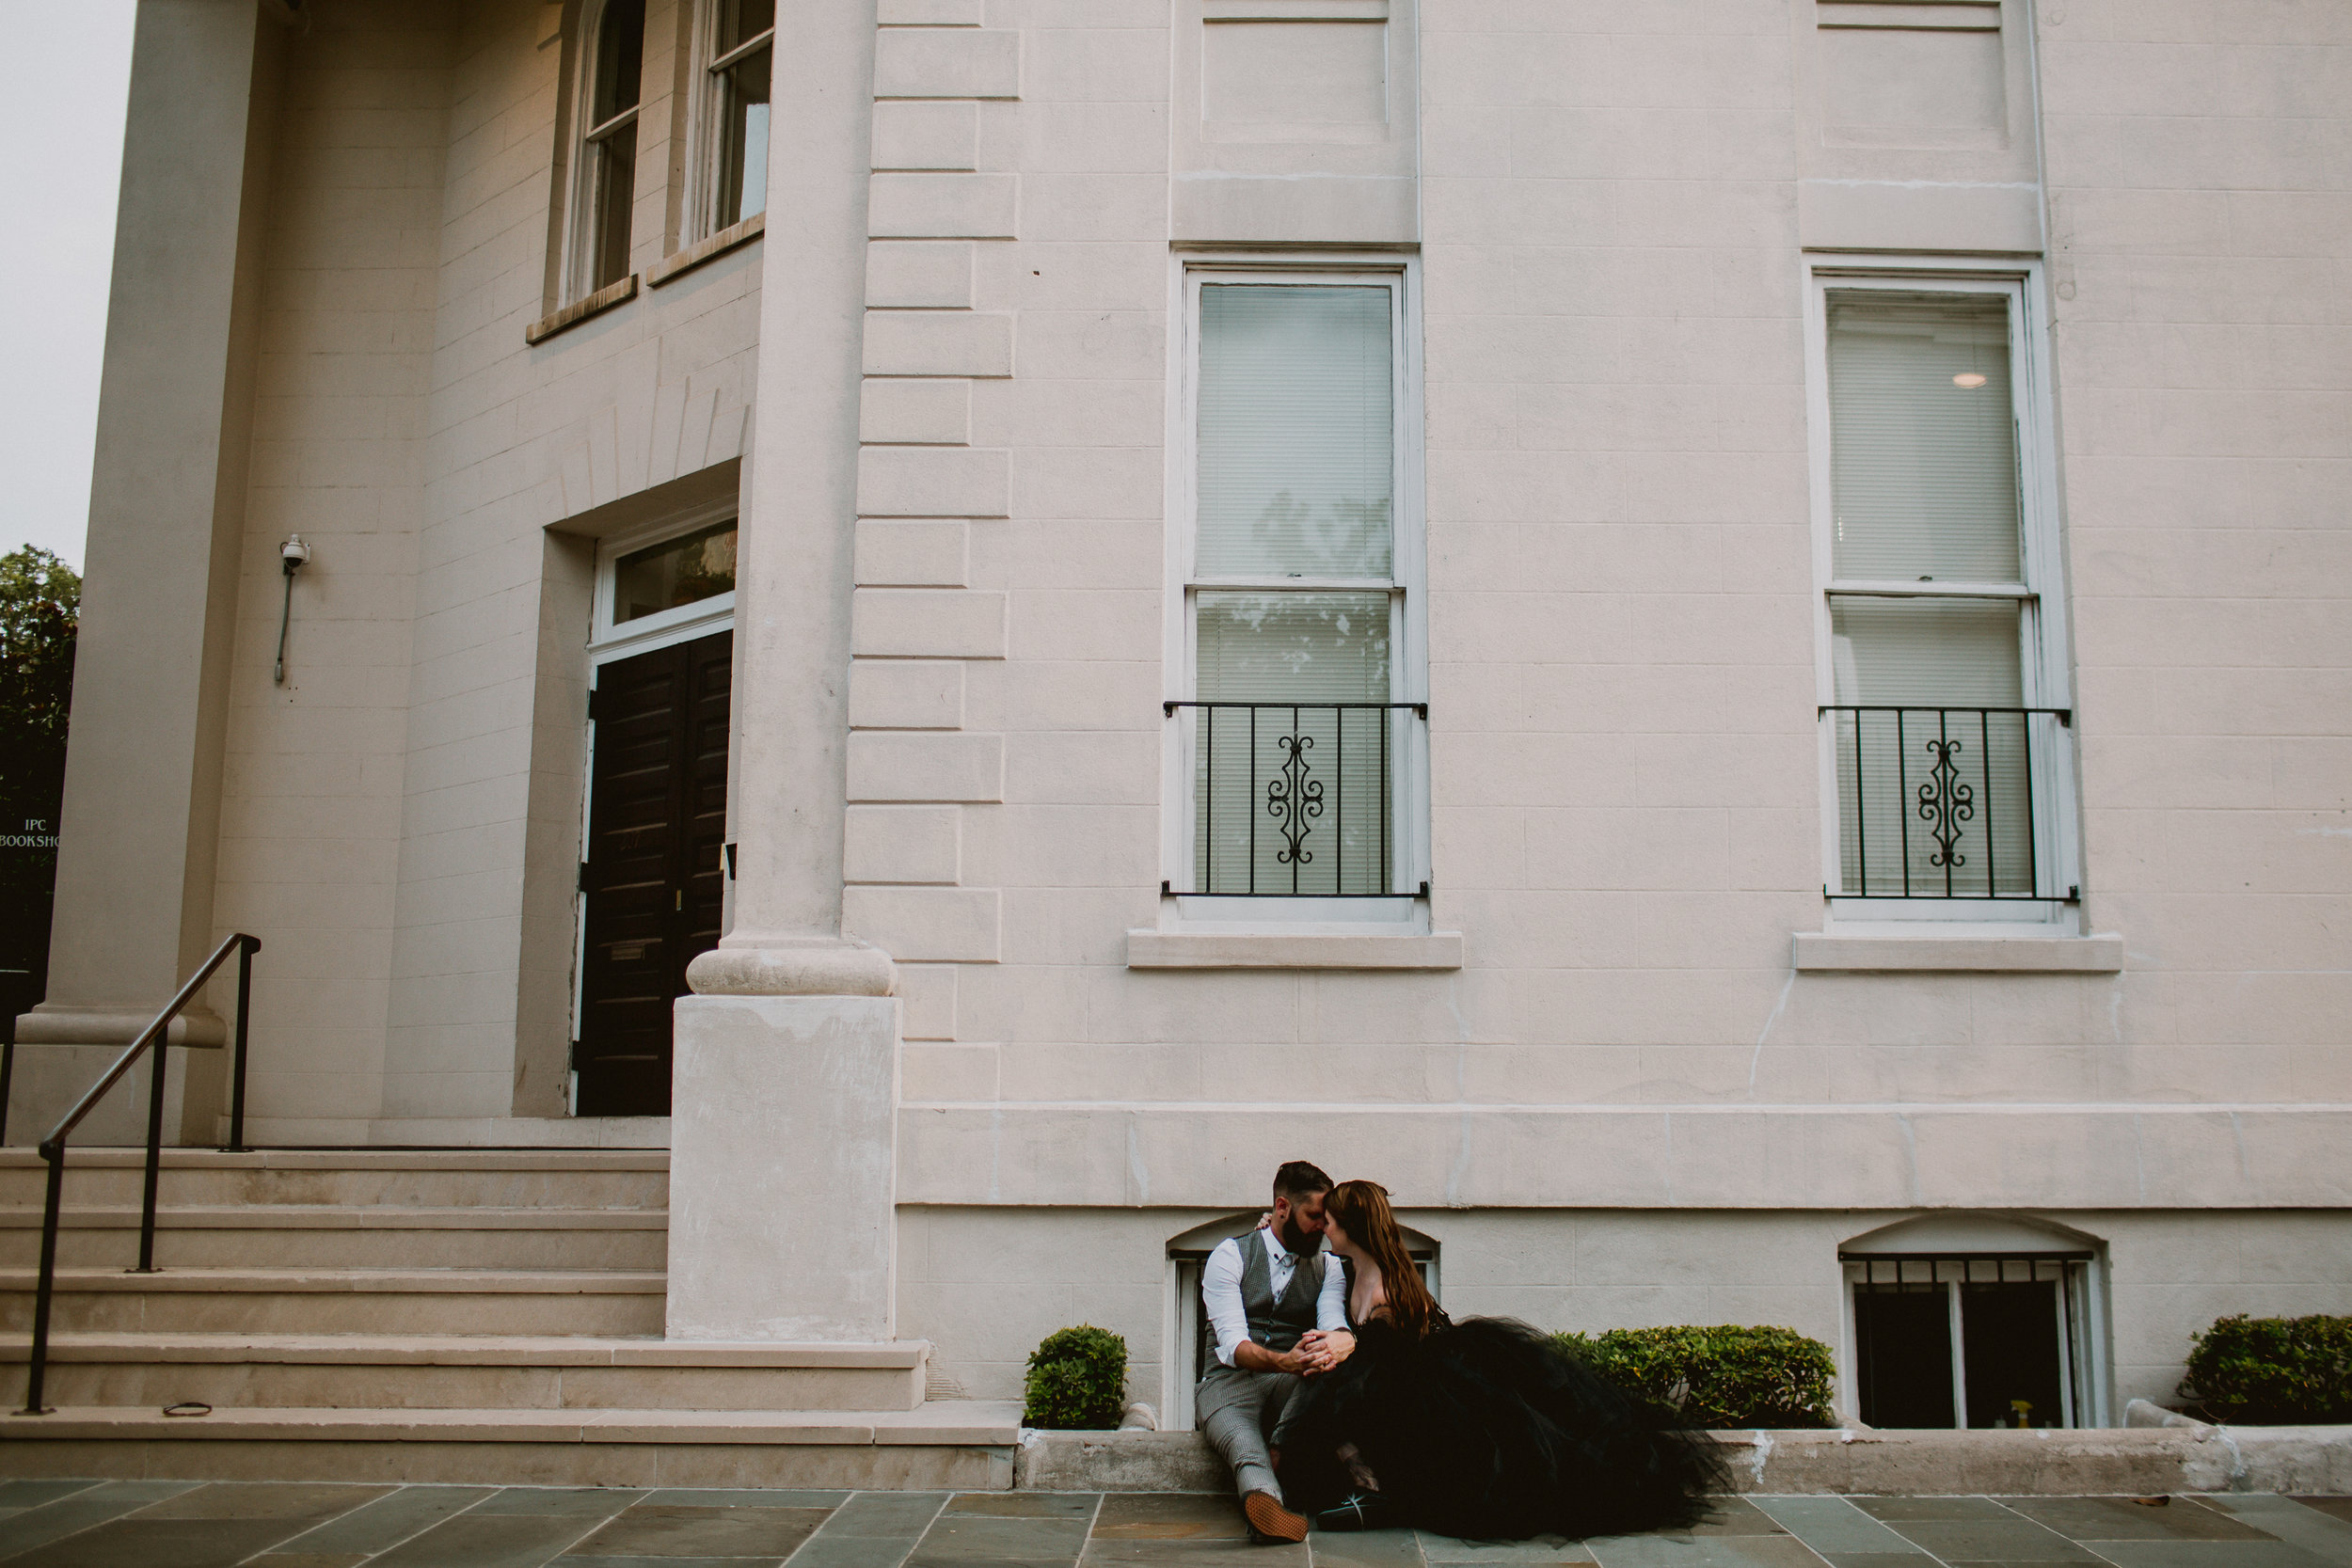 bohemian-hotel-savannah-elopement-kelley-raye-atlanta-wedding-photographer-155.jpg